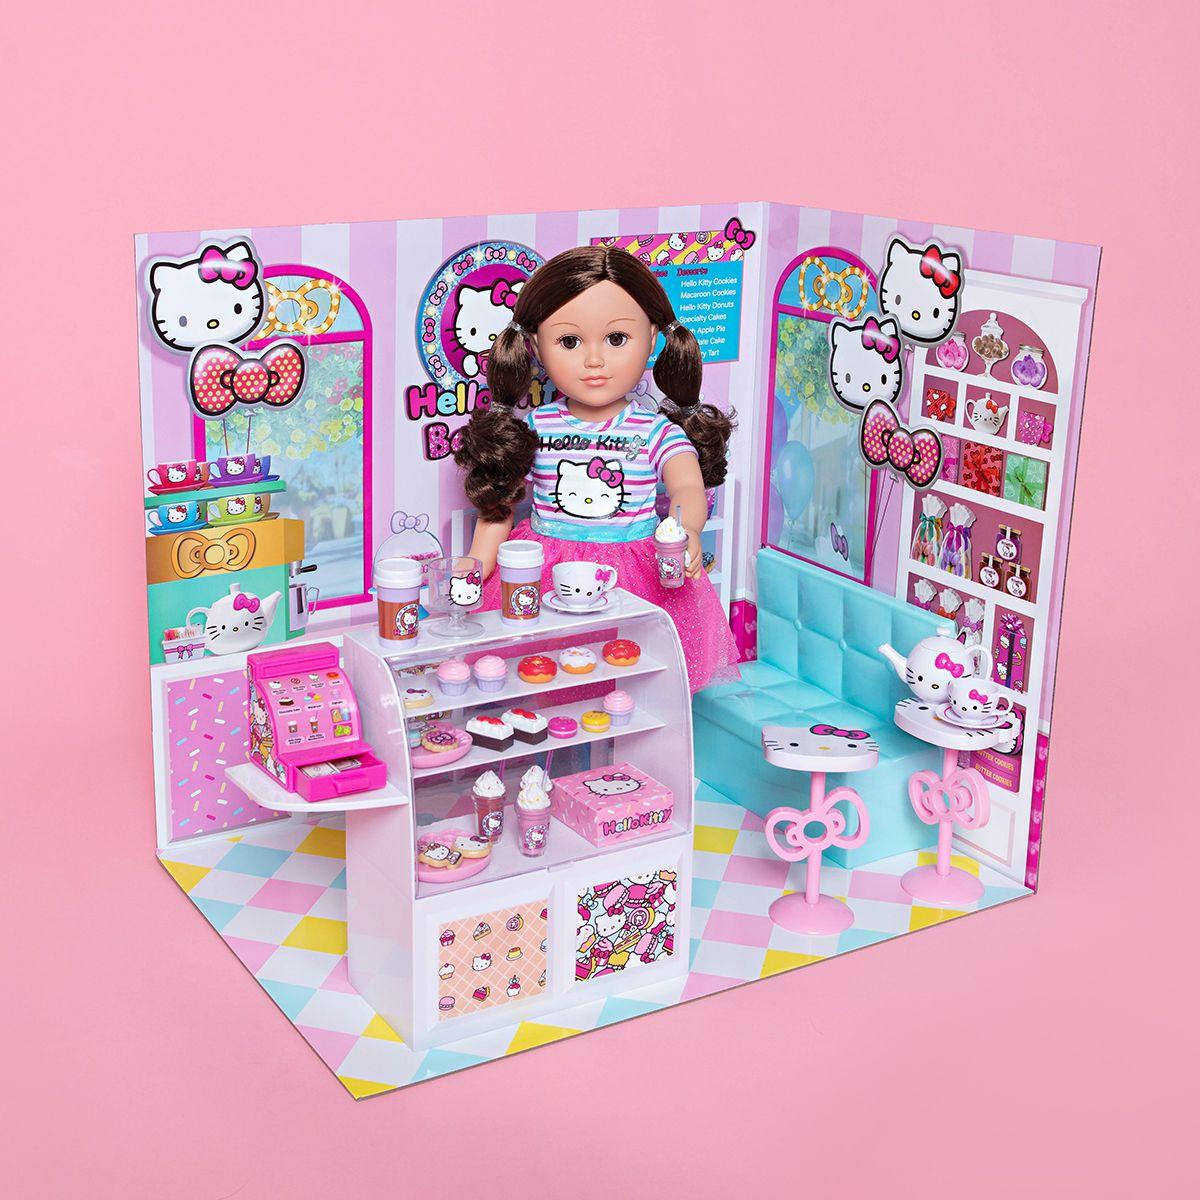 My Life As Hello Kitty Bakery Play Set For 18 Dolls 44 Pieces Walmart Com Hello Kitty Toys Hello Kitty Themes Hello Kitty Kitchen